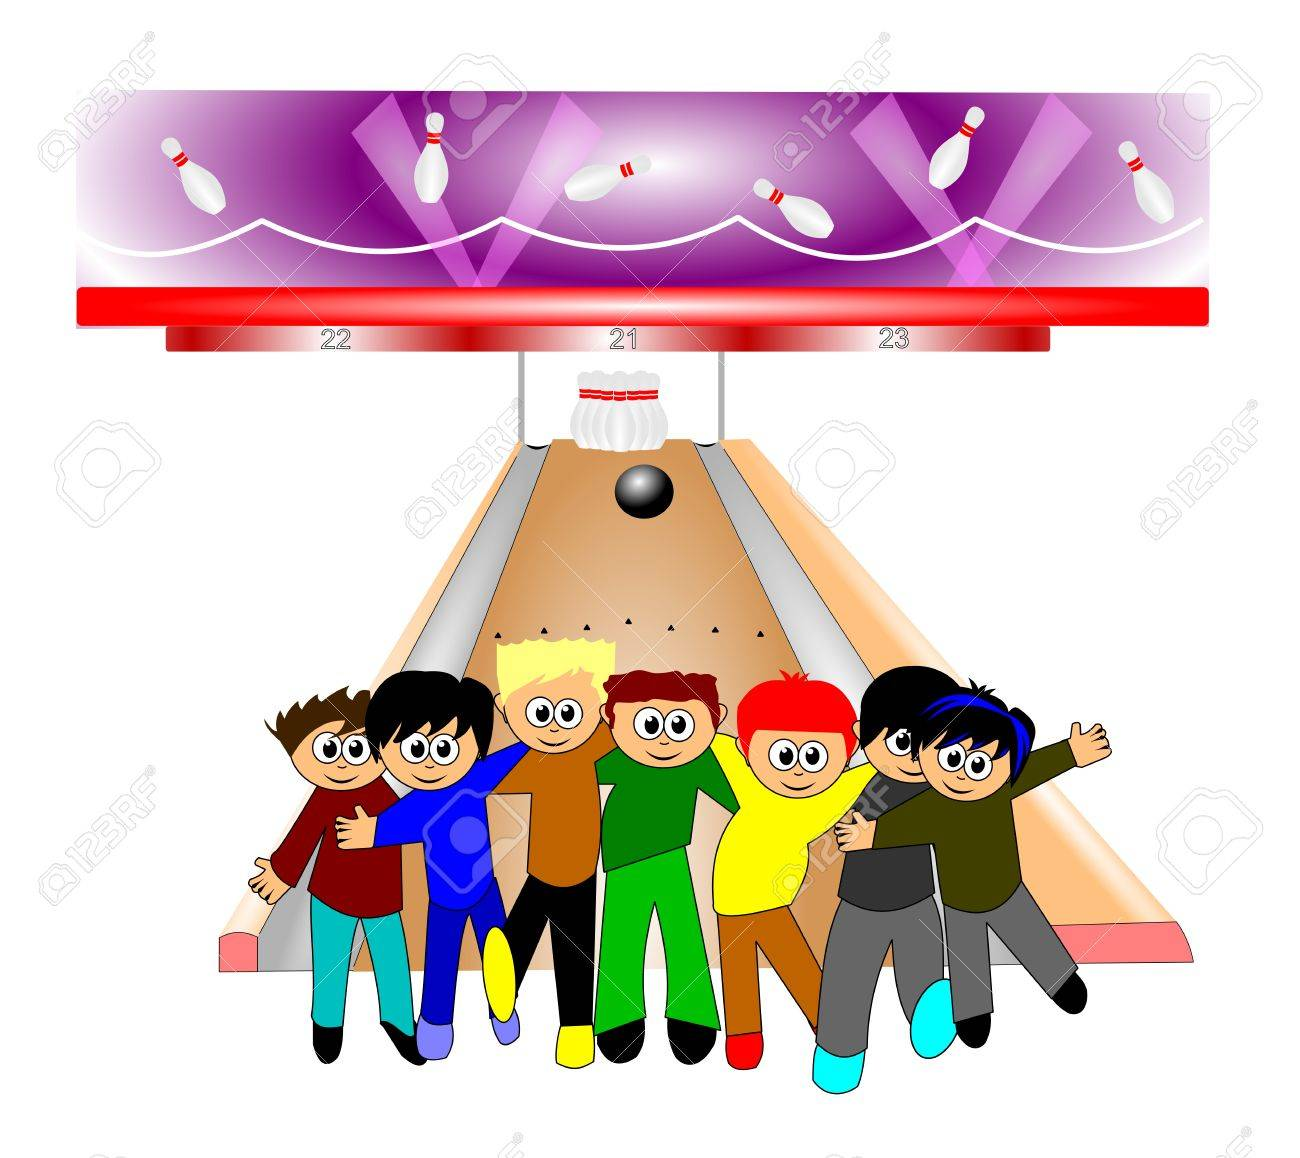 kids in bowling alley.